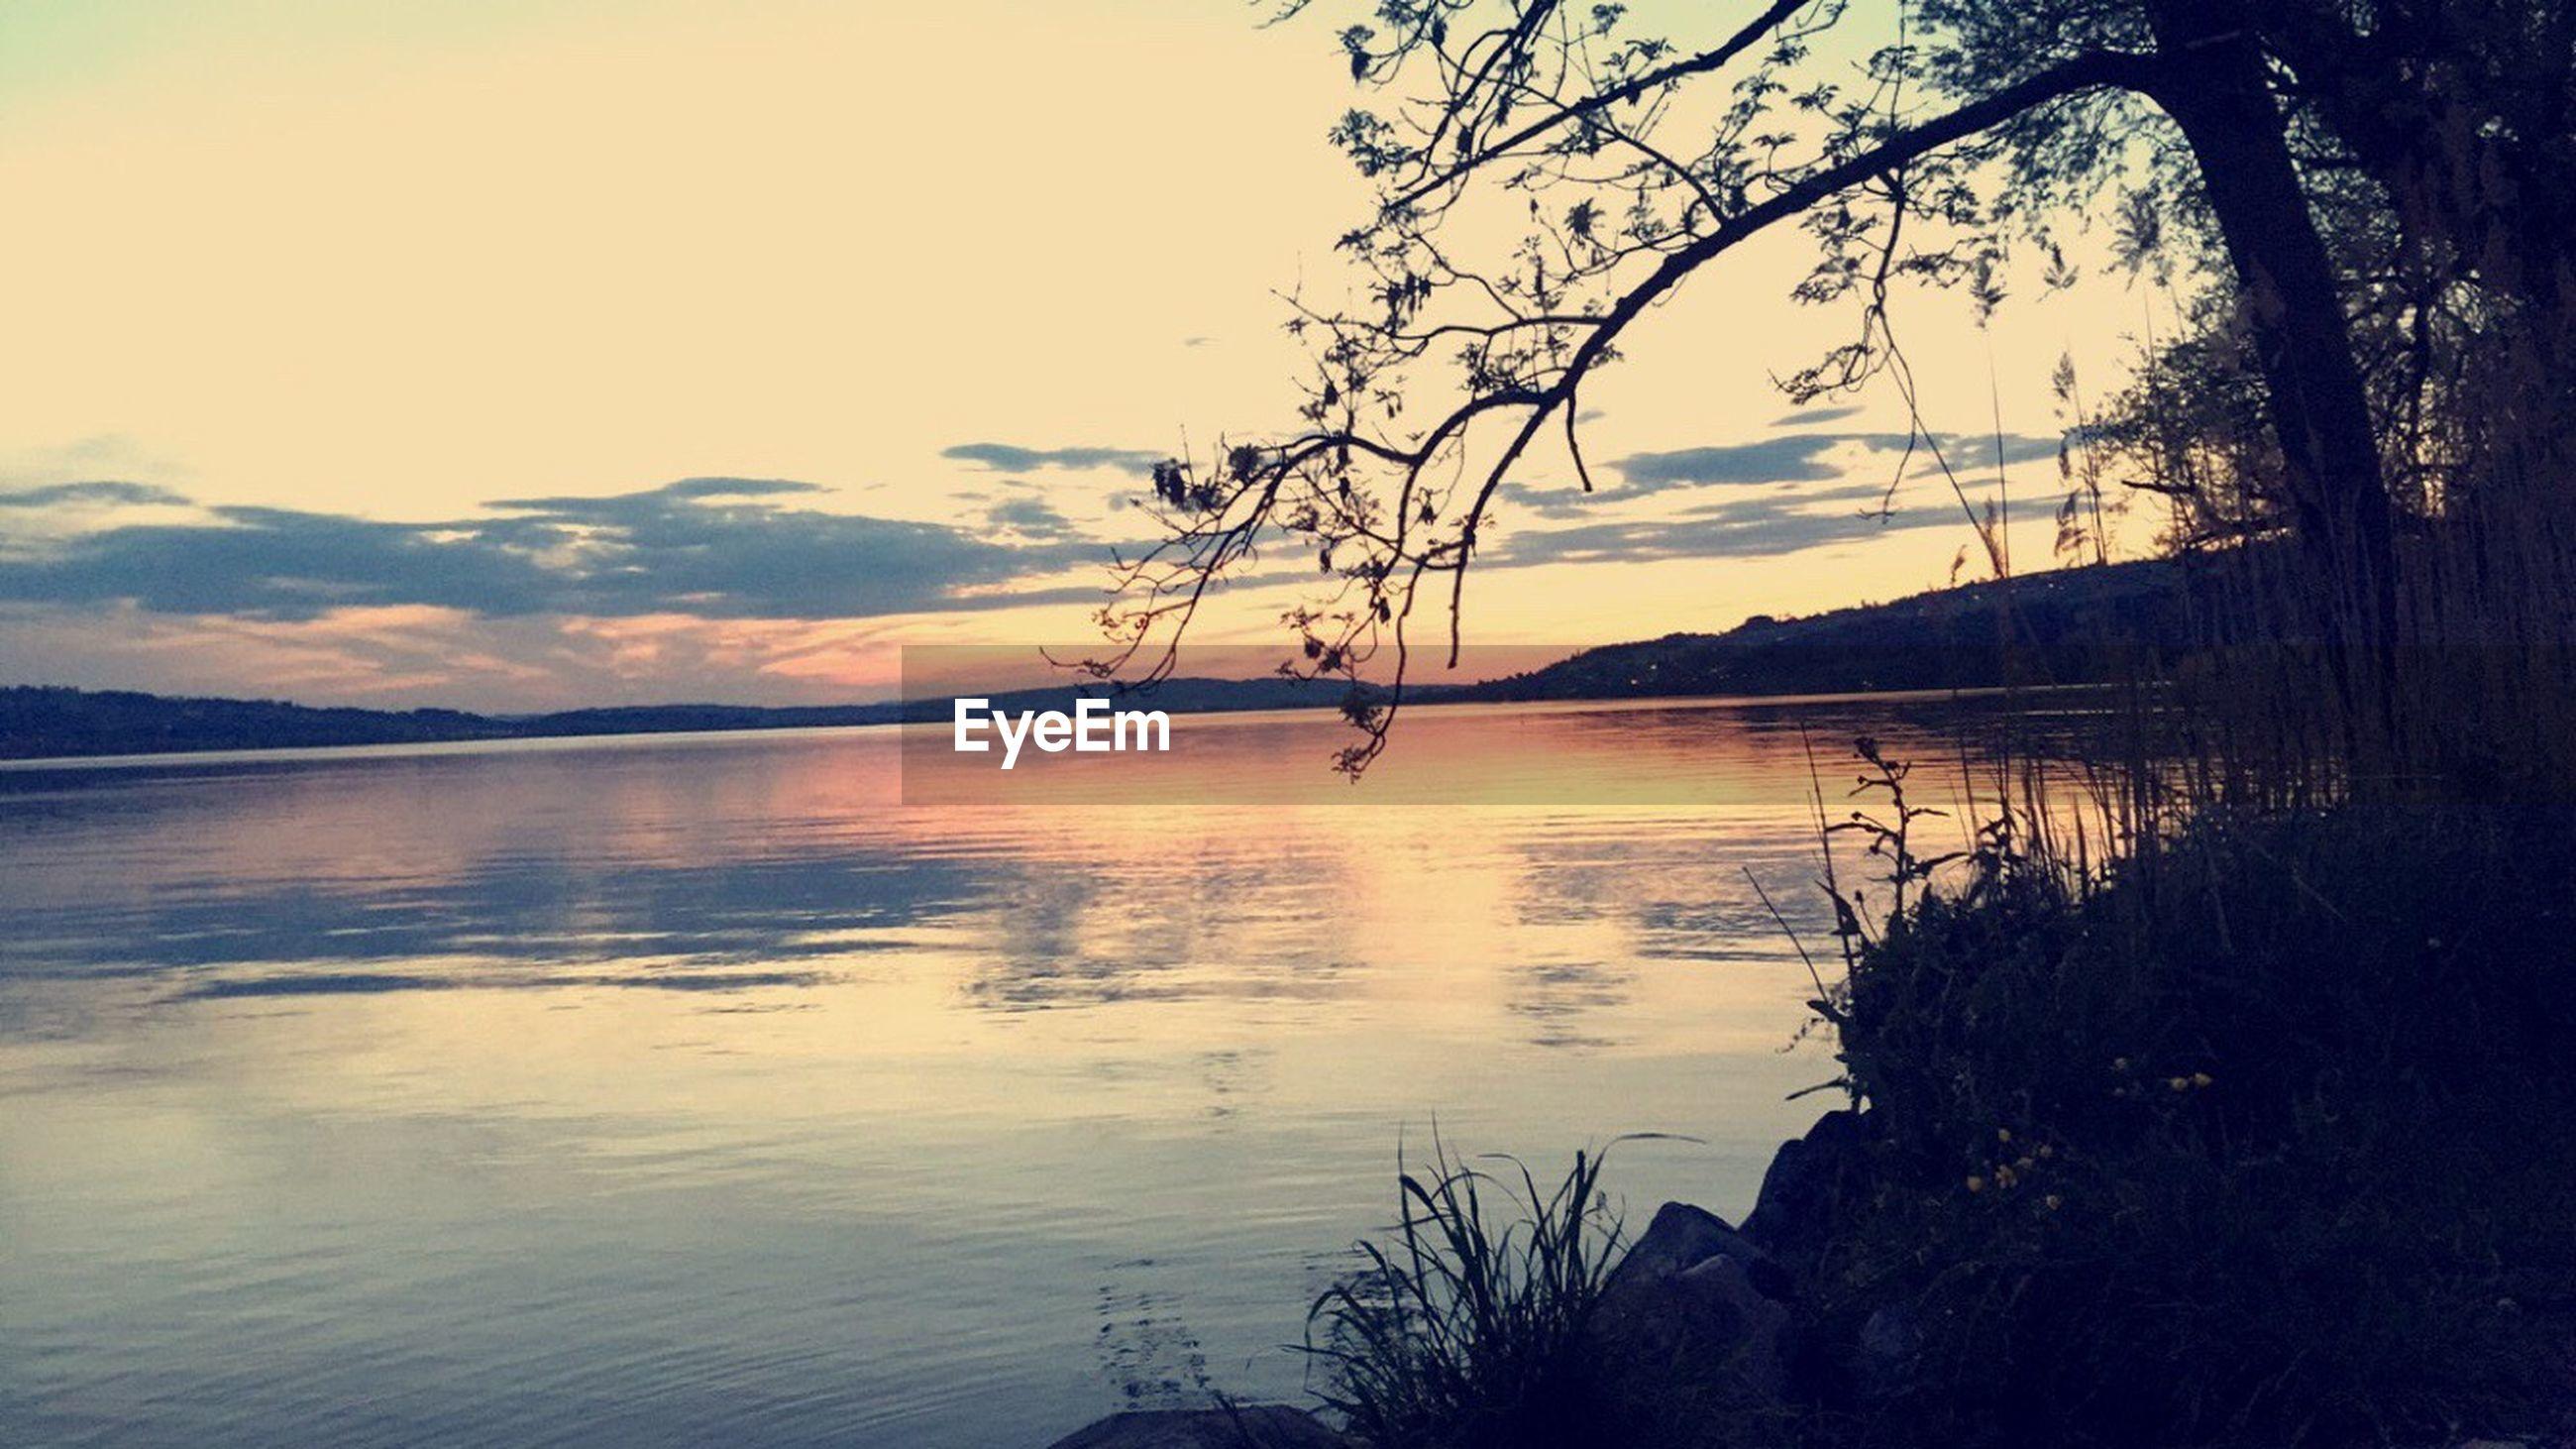 water, sunset, tranquil scene, tranquility, scenics, silhouette, beauty in nature, sky, reflection, lake, mountain, tree, nature, idyllic, sun, sea, nautical vessel, cloud - sky, non-urban scene, mountain range